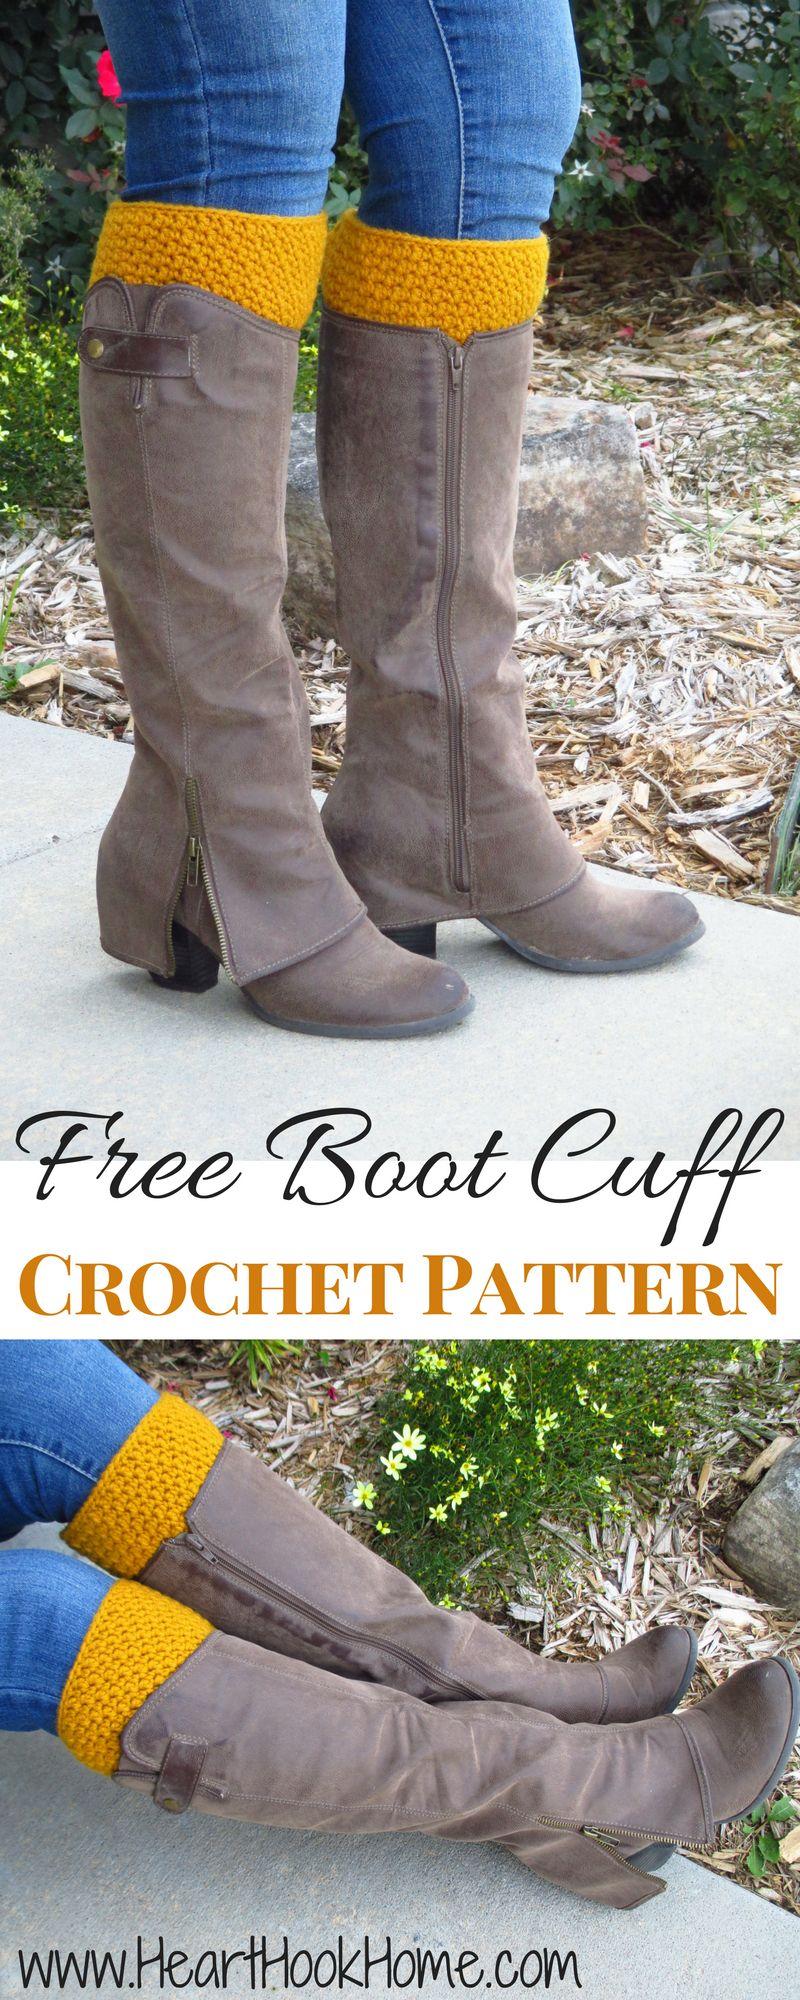 30+ Inspired Image of Crochet Boot Cuffs Pattern Free - vanessaharding.com #bootcuffs